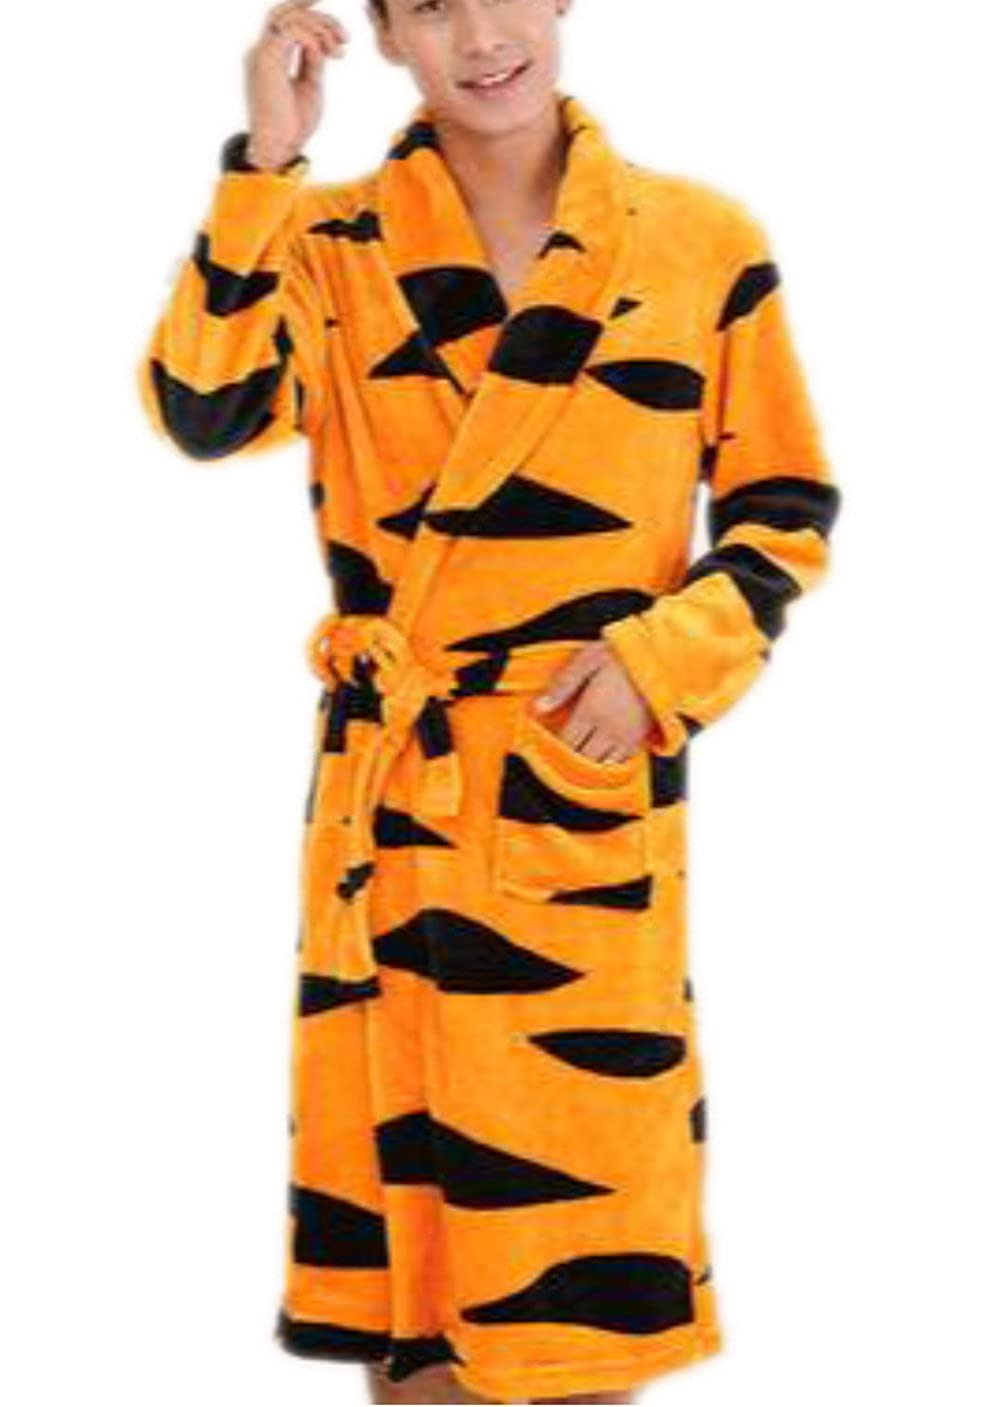 RESPEEDIME Mens Flannel Pajamas Autumn Winter Nightgown Warm Bathrobe Robe